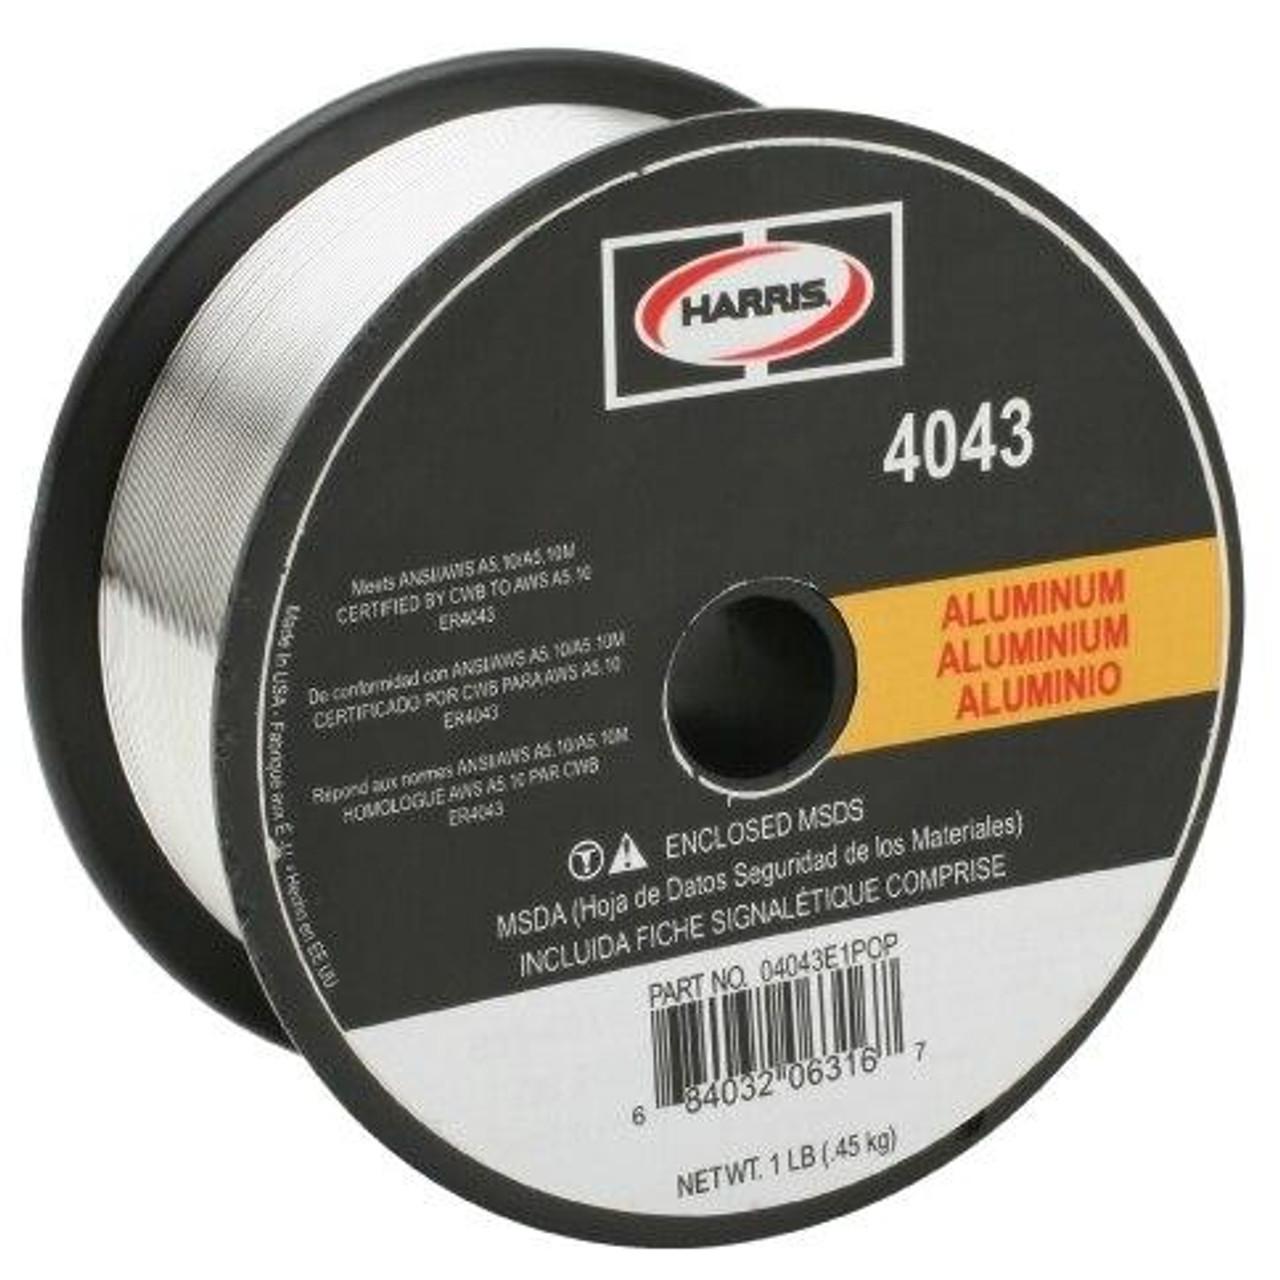 Harris 4043 Aluminum Solid MIG Welding Wire .035 - 1 lb